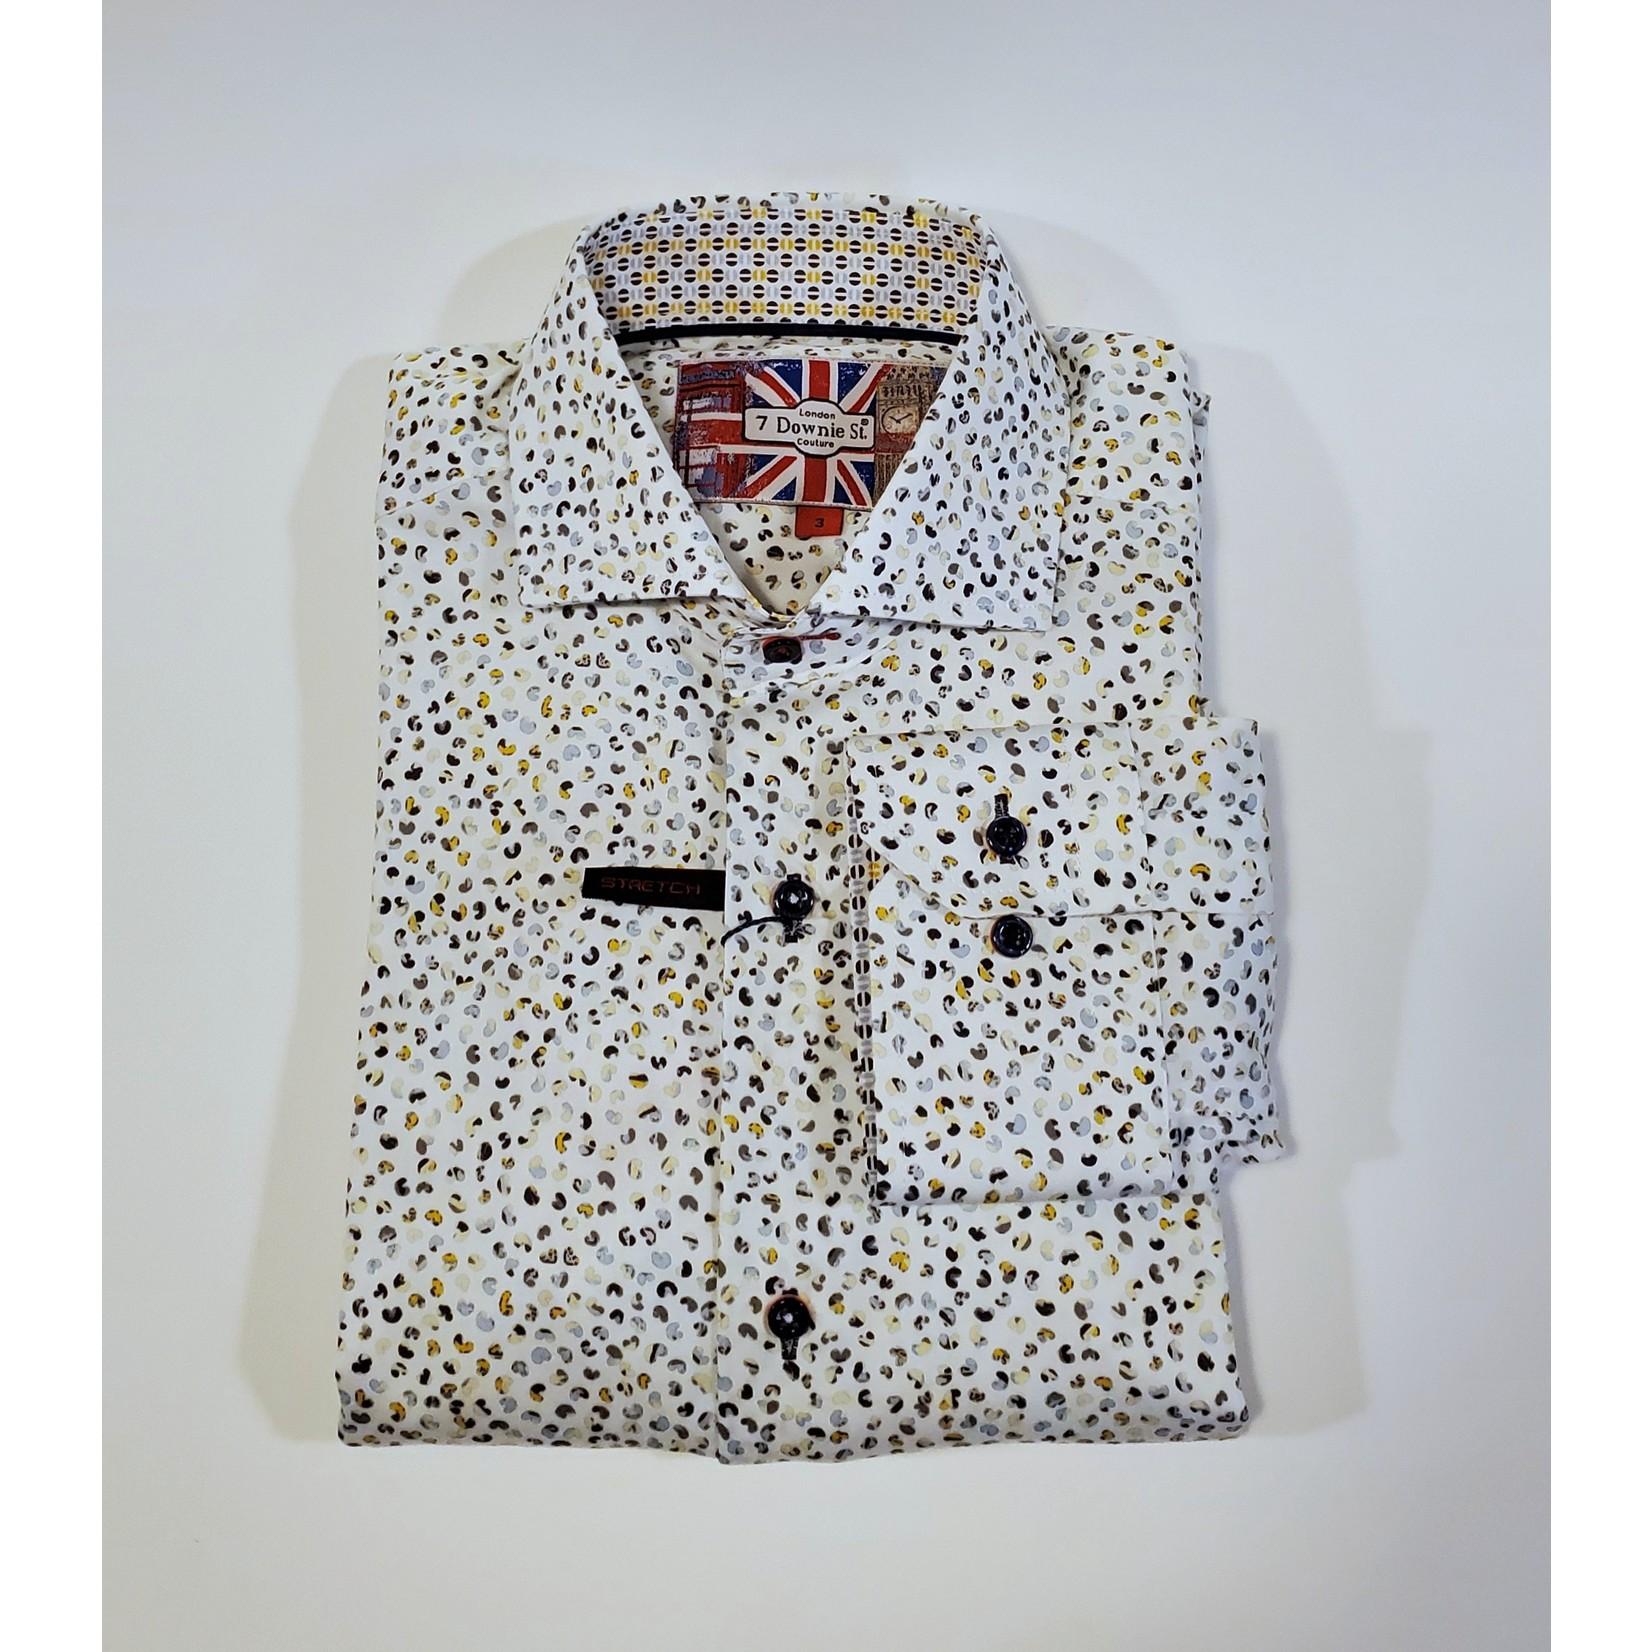 7 Downie St. 7 Downie St Long-Sleeve Spring Sportshirts - Multiple Patterns